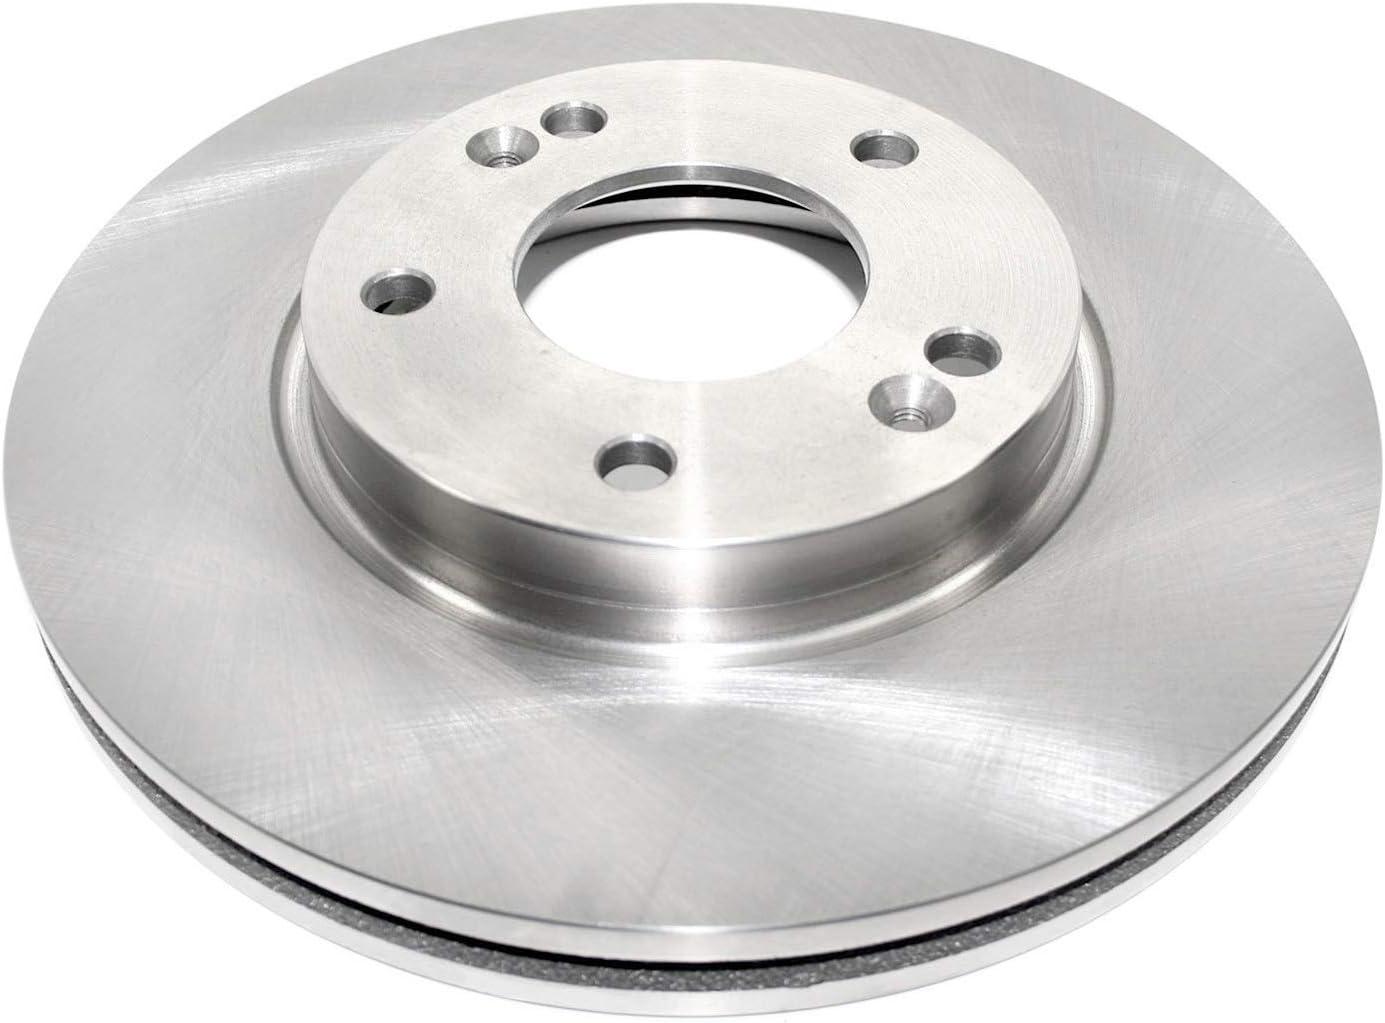 DuraGo BR34140 Front Vented Disc Brake Rotor